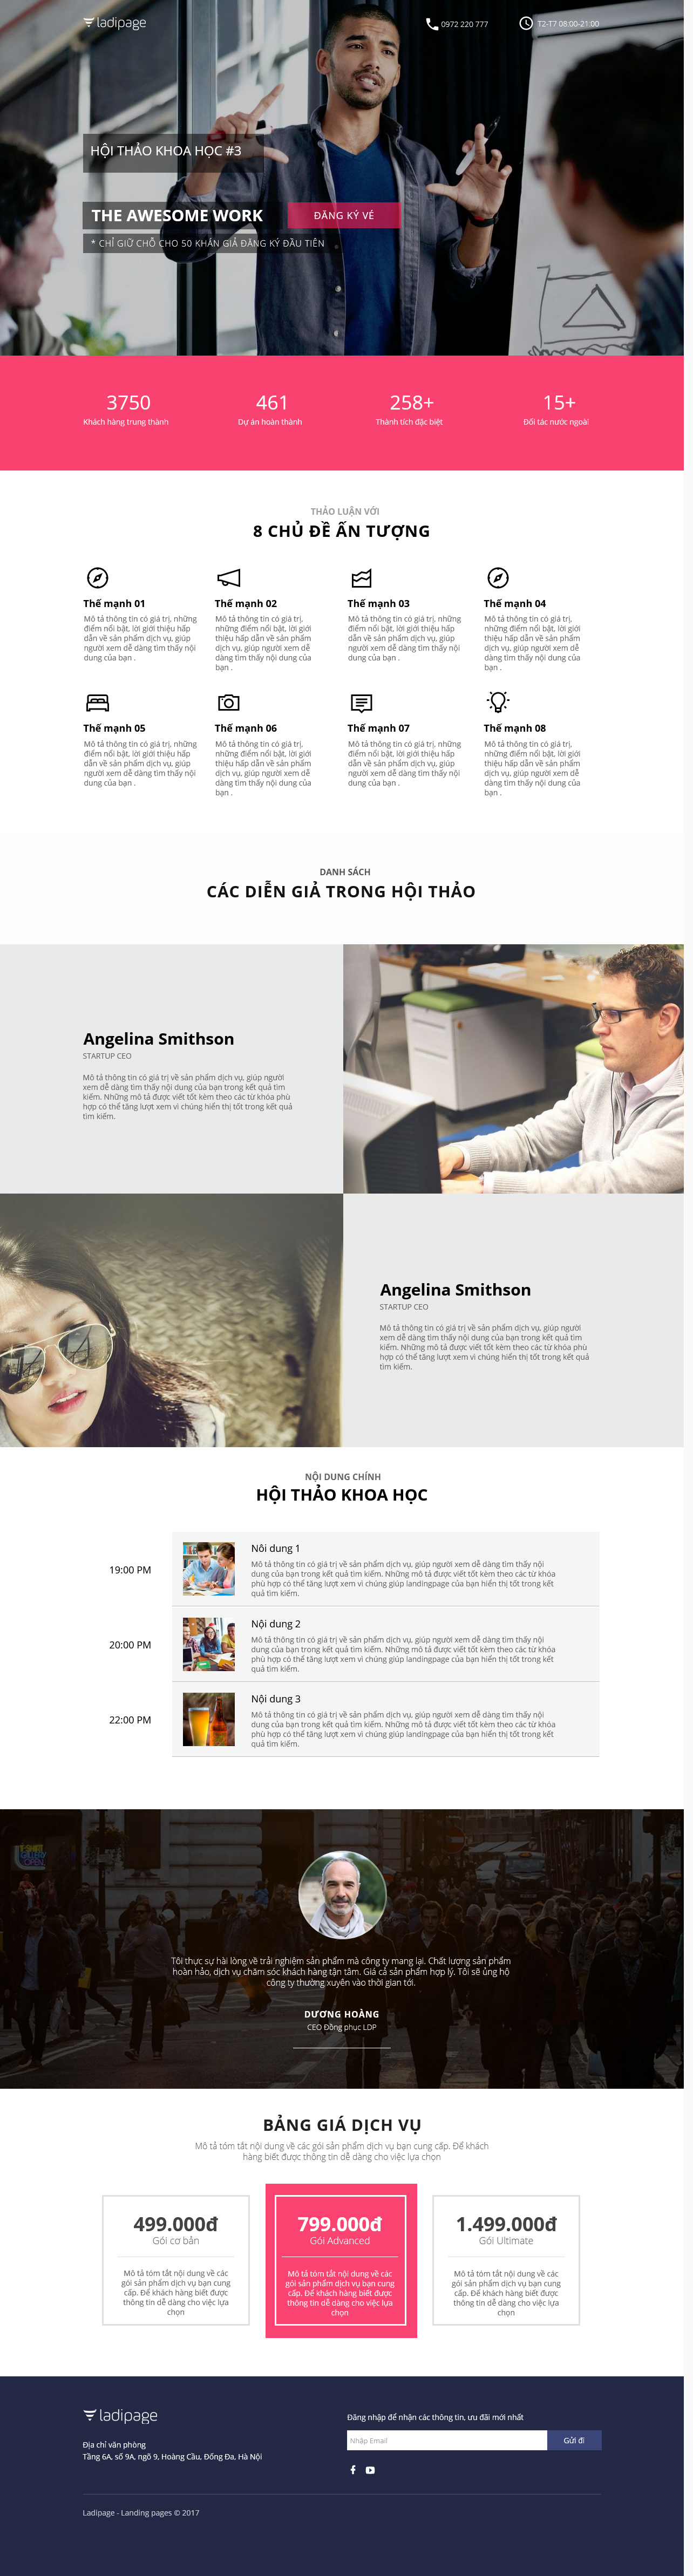 Thiết kế website Thiết kế webiste landingpage su-kien---hoi-thao Sự kiện 9